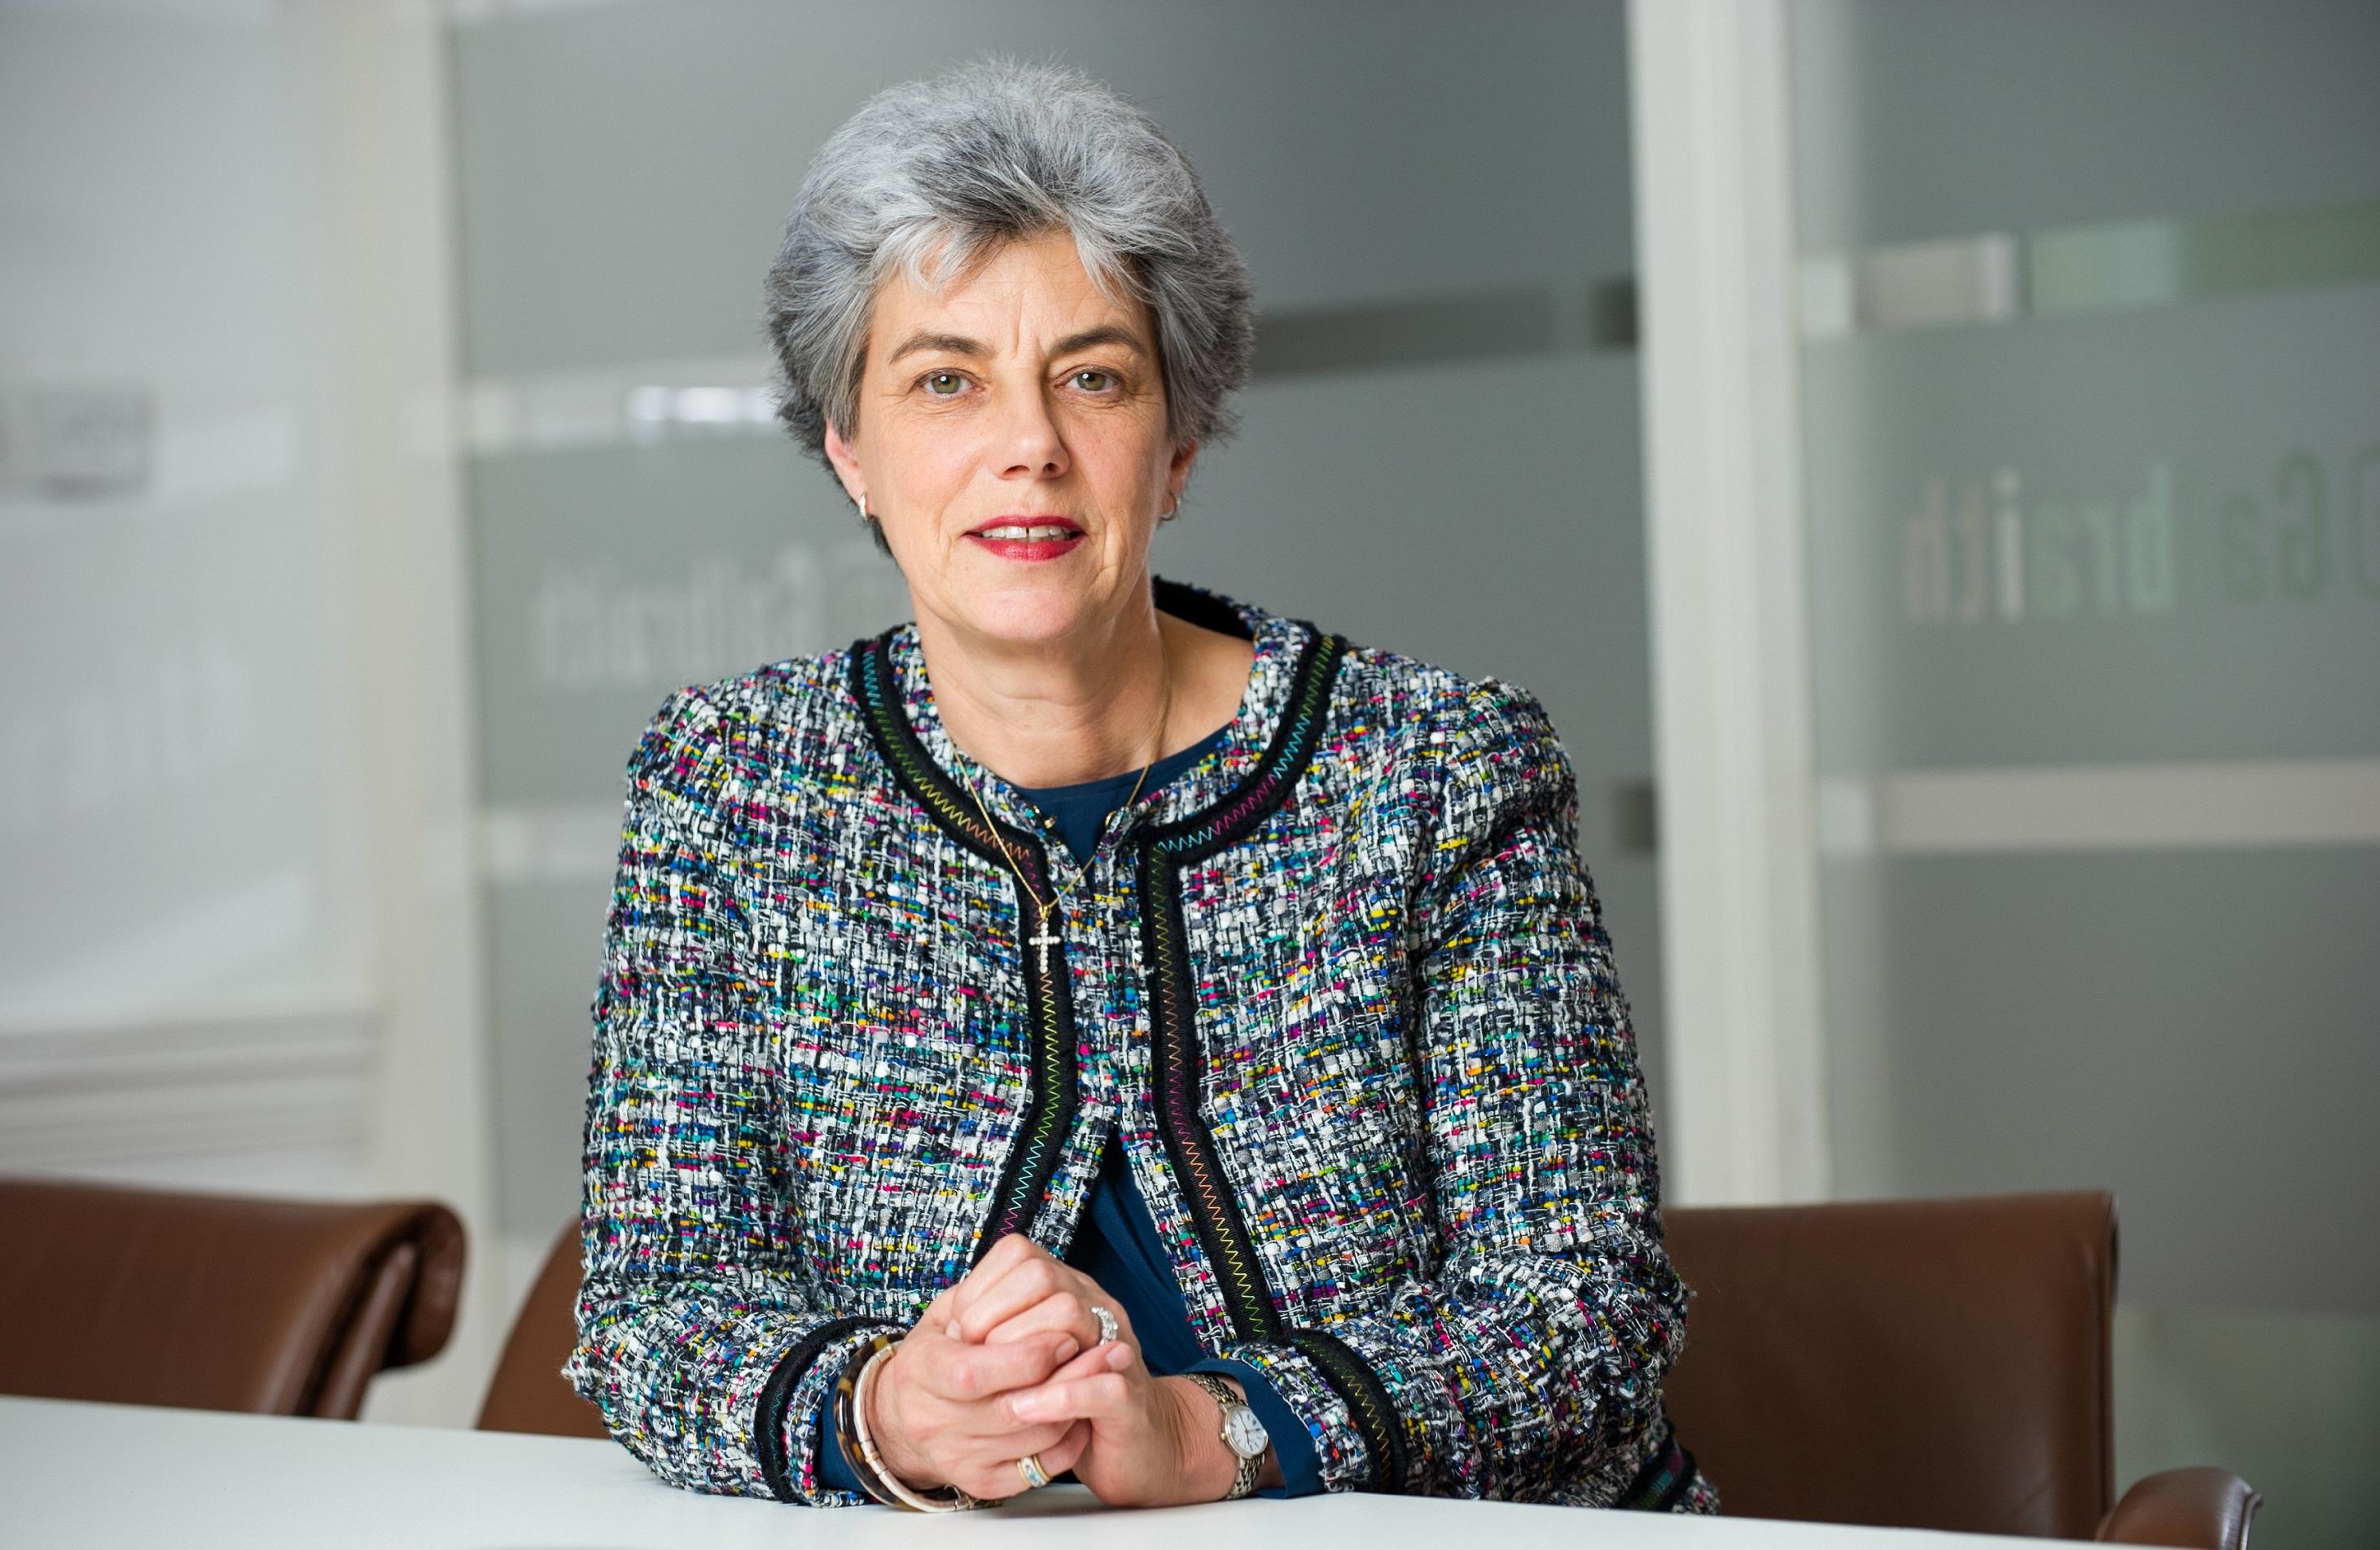 Galbraith chief executive Pam Over. Picture: Stuart Nicol.